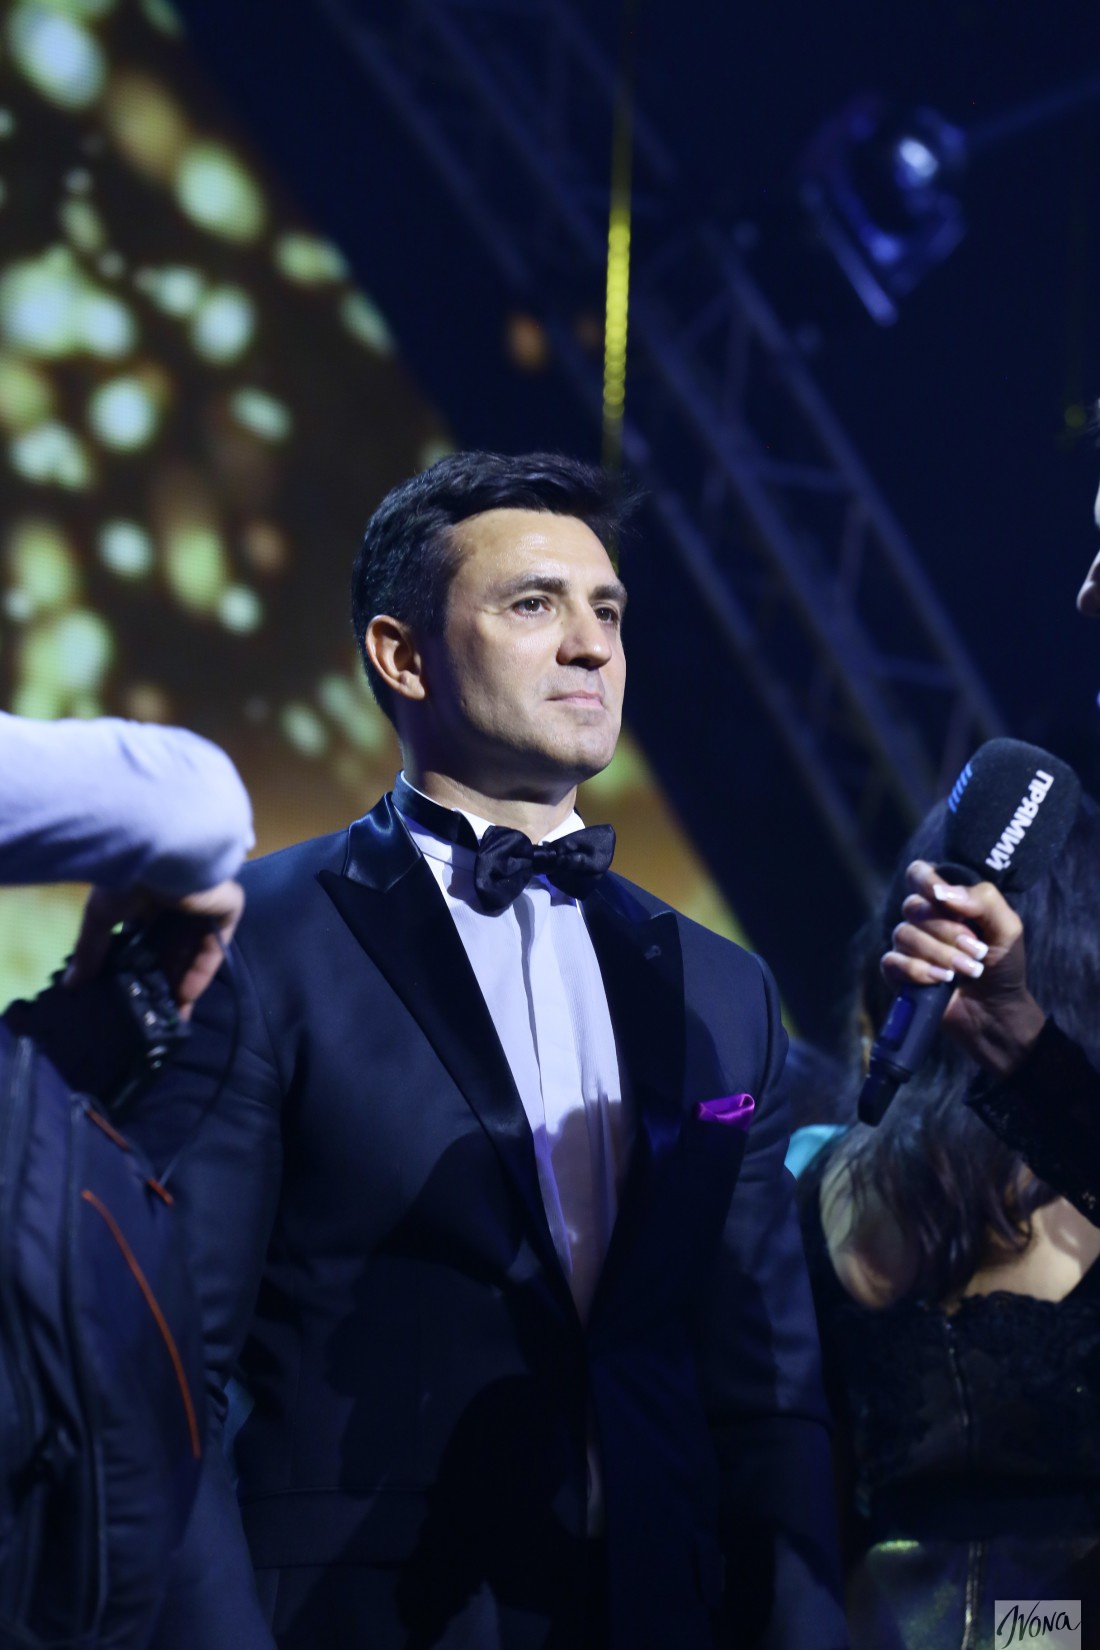 Николай Тищенко на Мисс Украина 2017